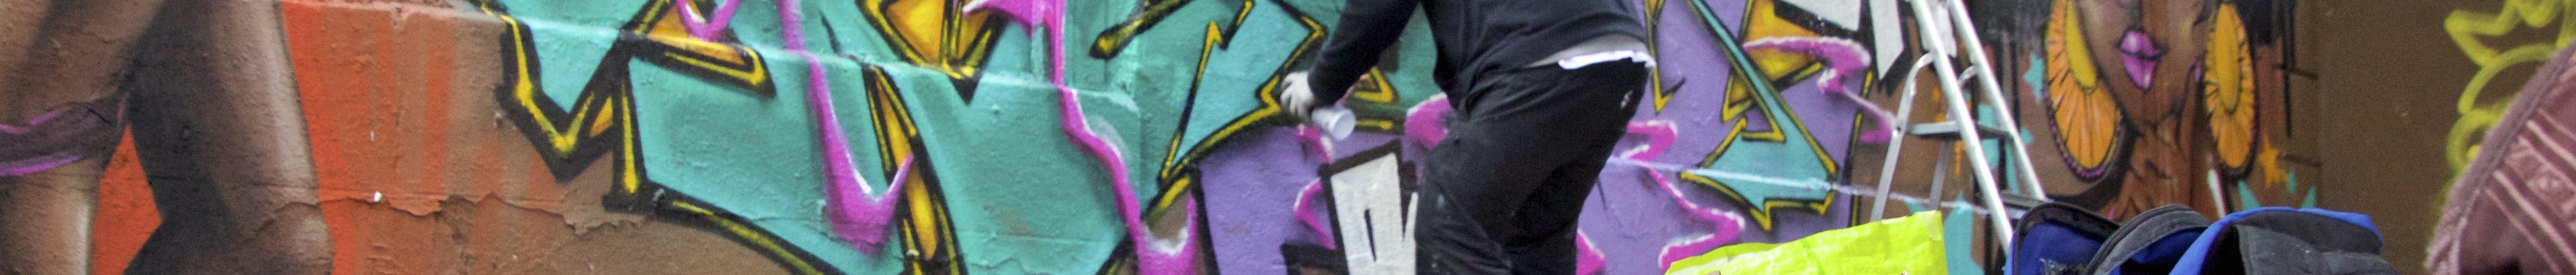 LR Funky Jam 2015